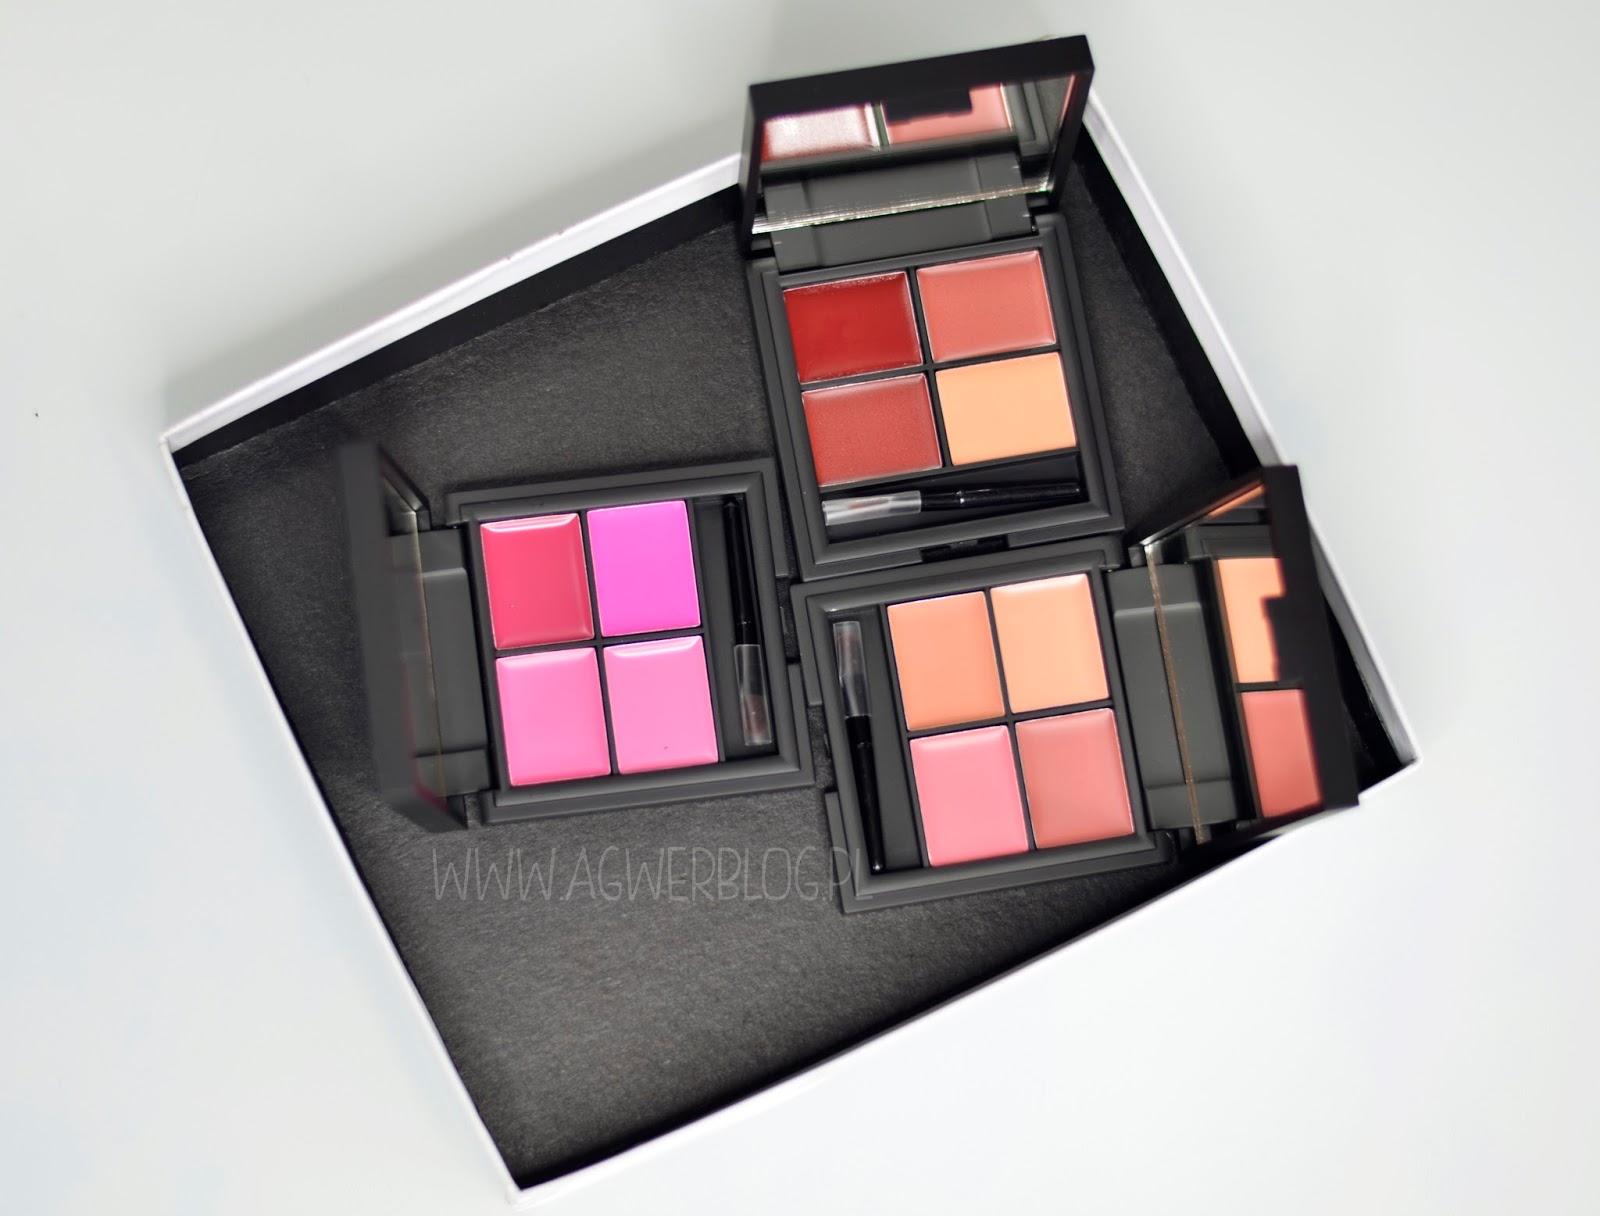 # Sleek lip 4 lipstick palette: Havana, Showgirl, Ballet